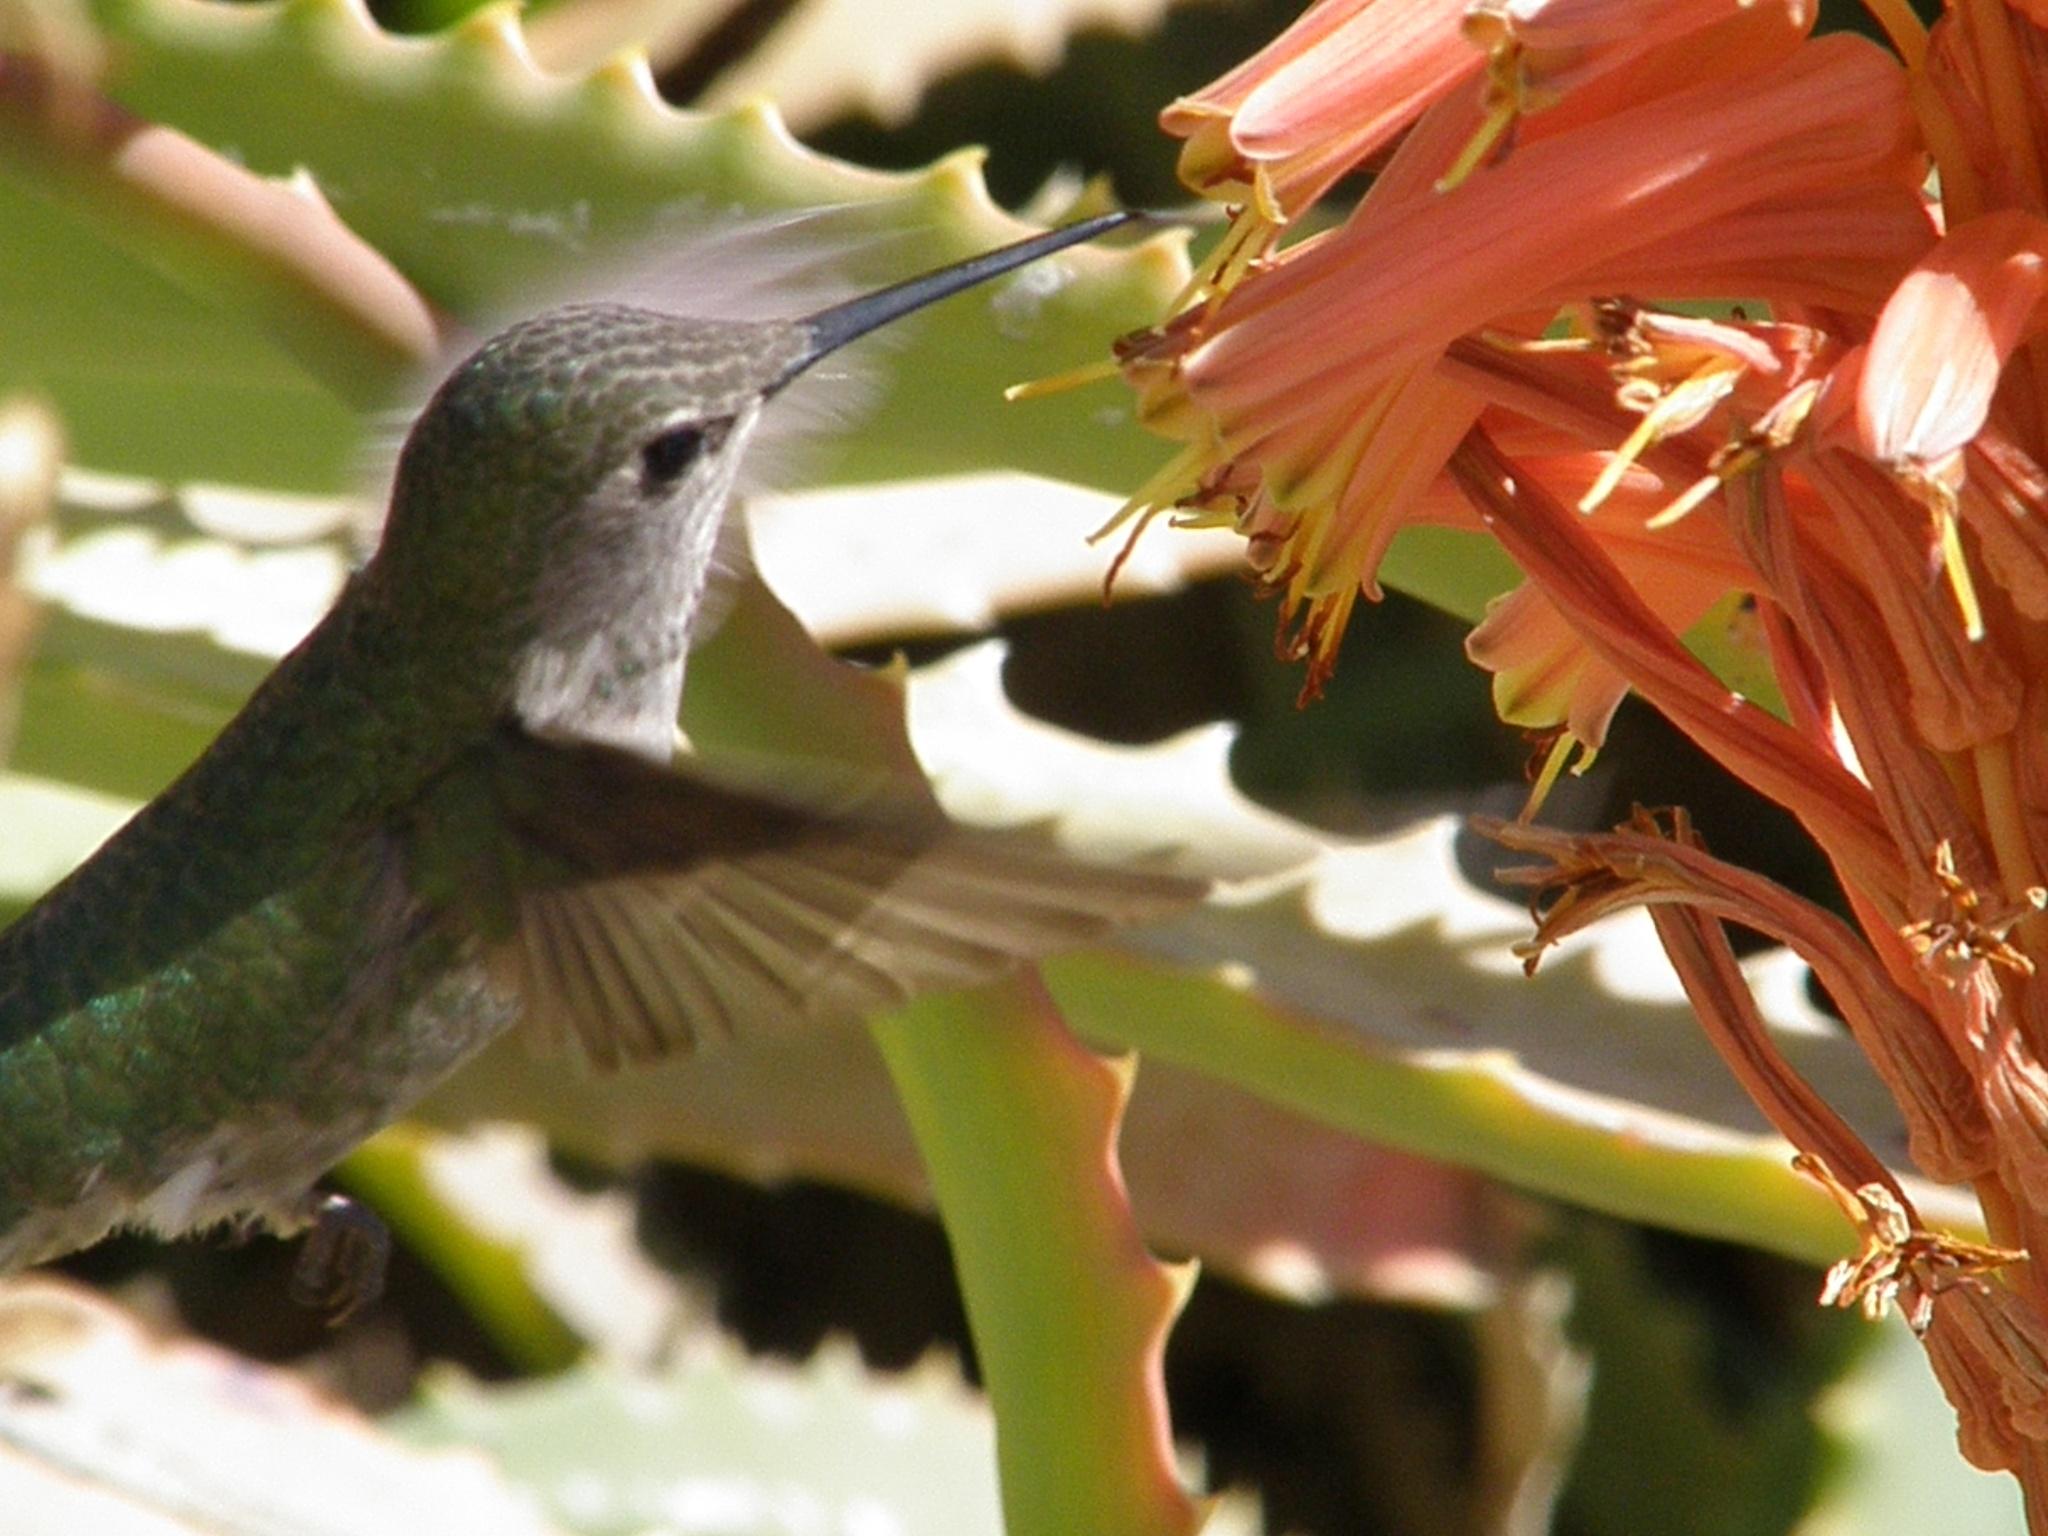 For Irina -- A Hummingbird Feeding From an Aloe Candle by ralph.s.carlson